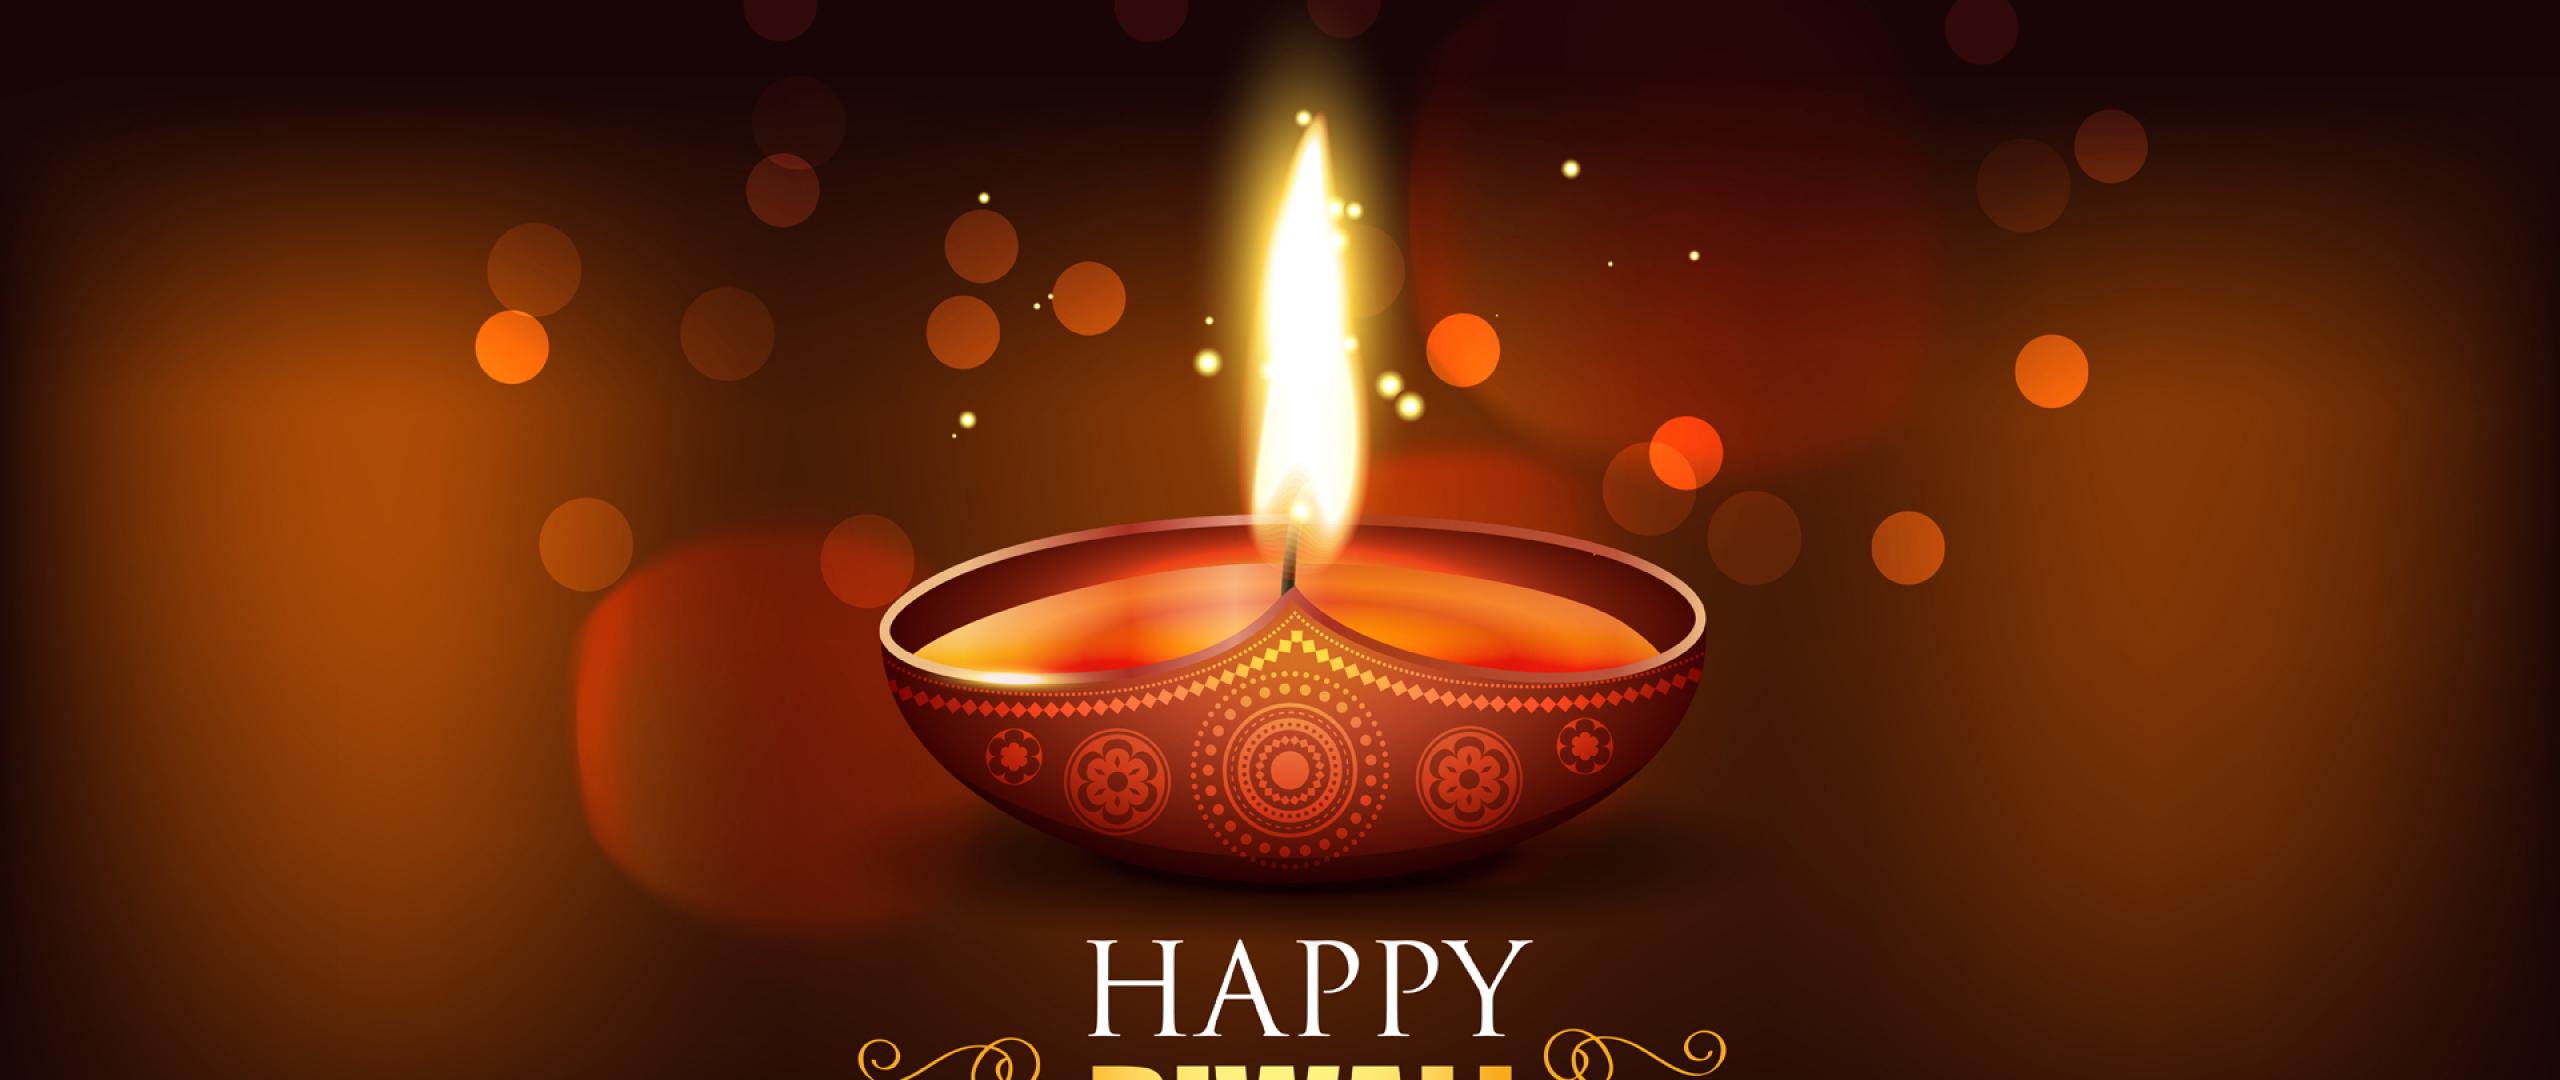 Happy Diwali 2020 Wallpaper in 2560x1080 Resolution